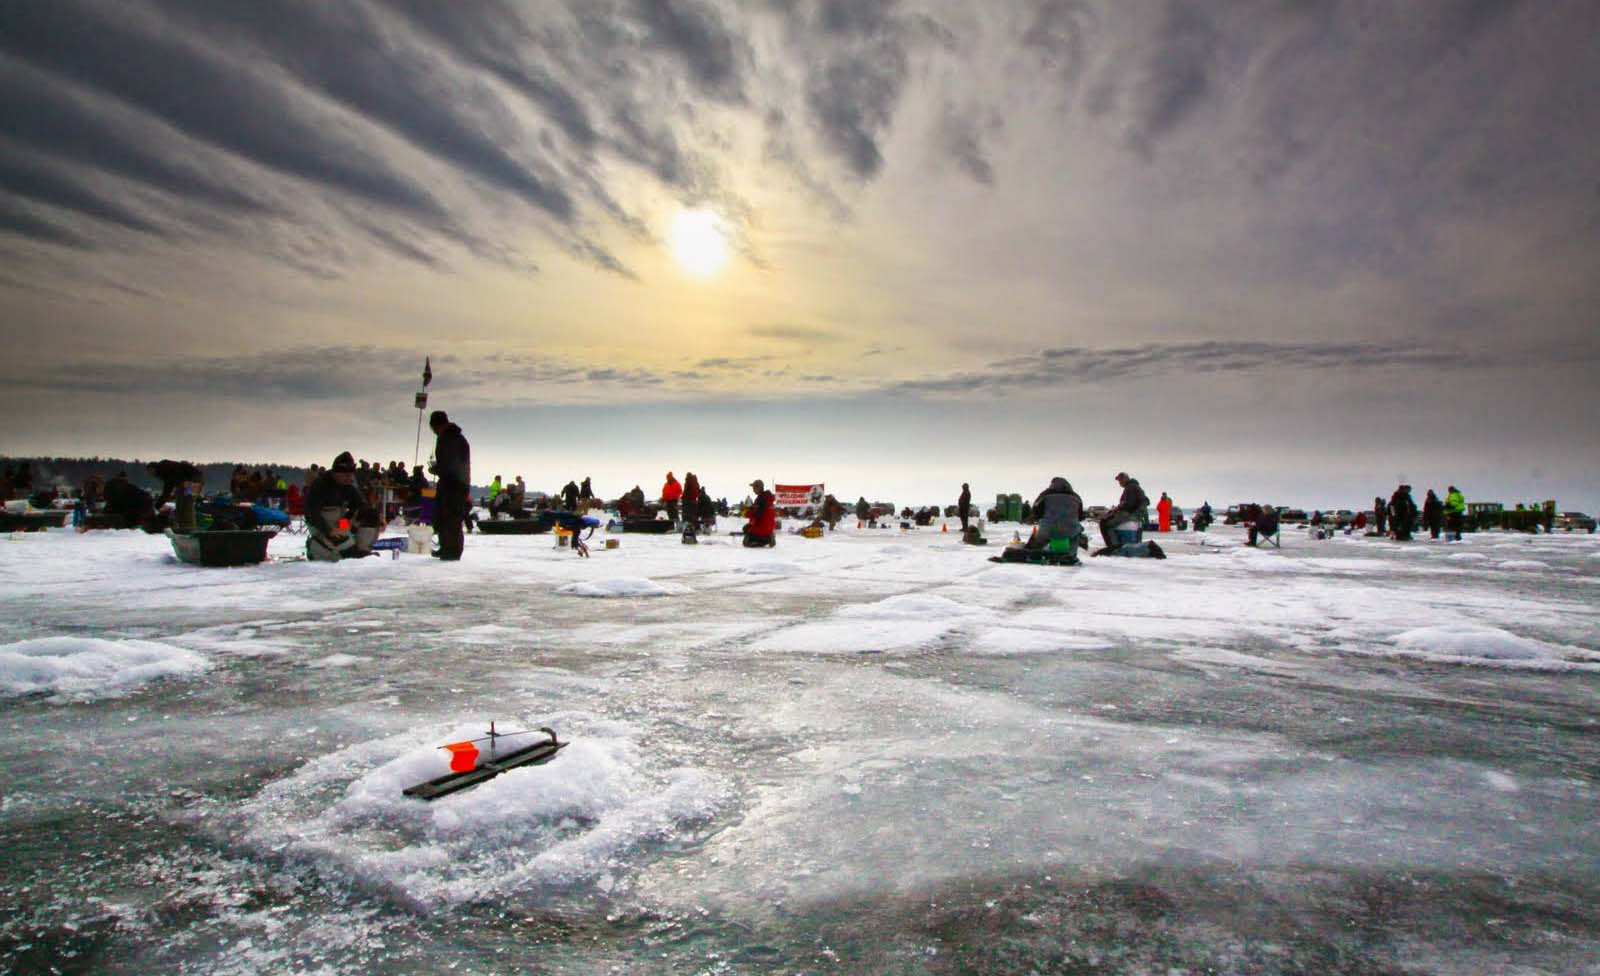 Brainerd jaycees 150 000 ice fishing extravaganza the for Brainerd ice fishing